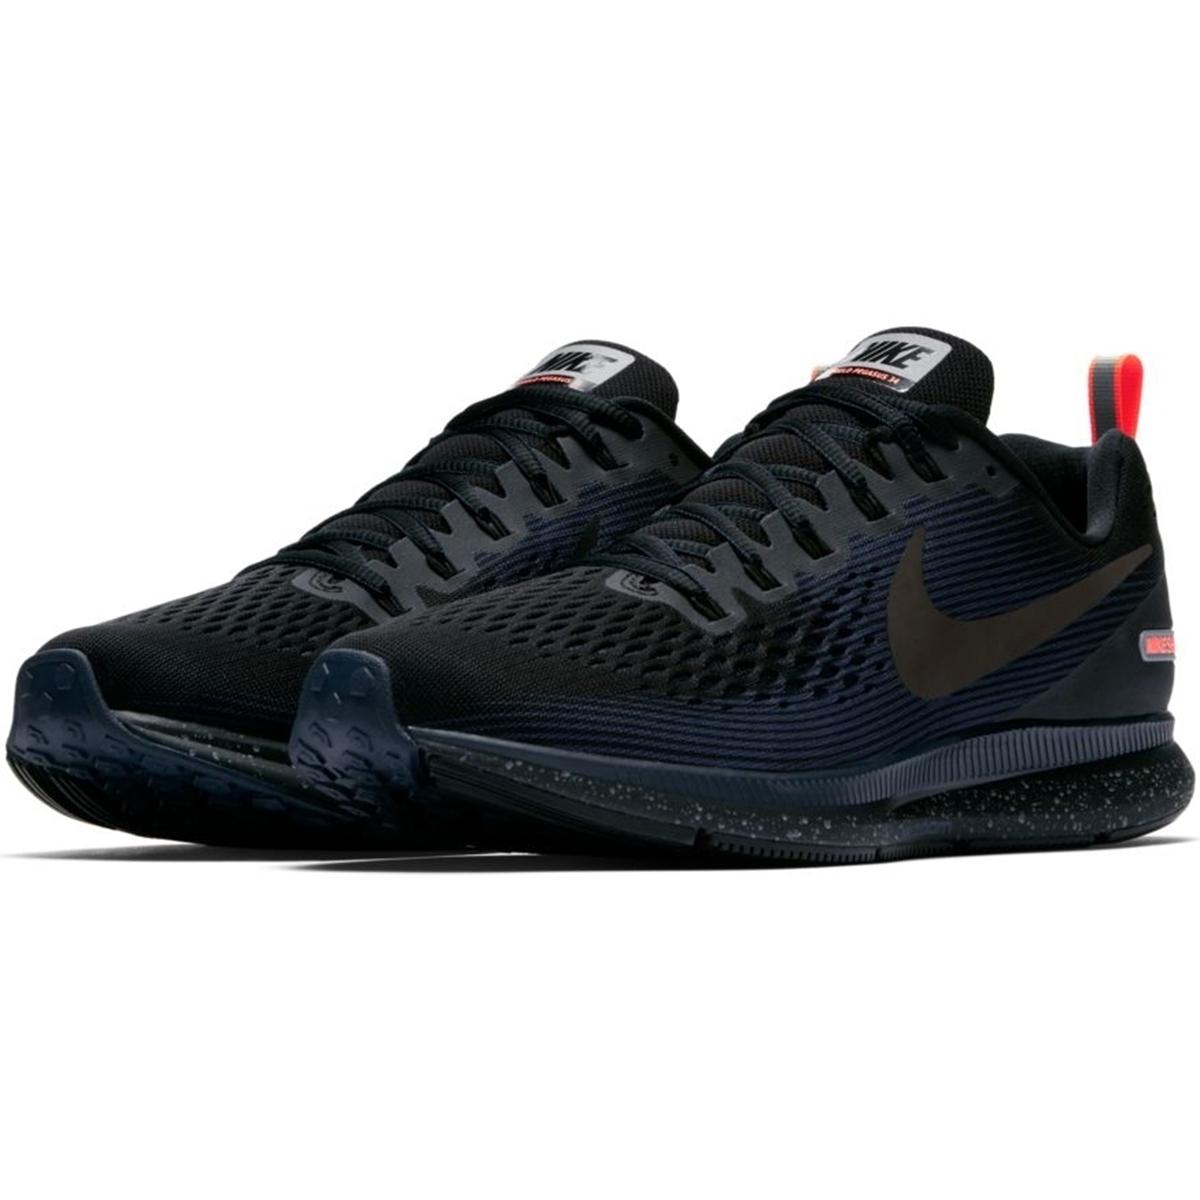 the best attitude 9e0c6 73197 Nike AIR ZOOM PEGASUS 34 SHIELD 907327-001- Nava Sport - Vi selger ...